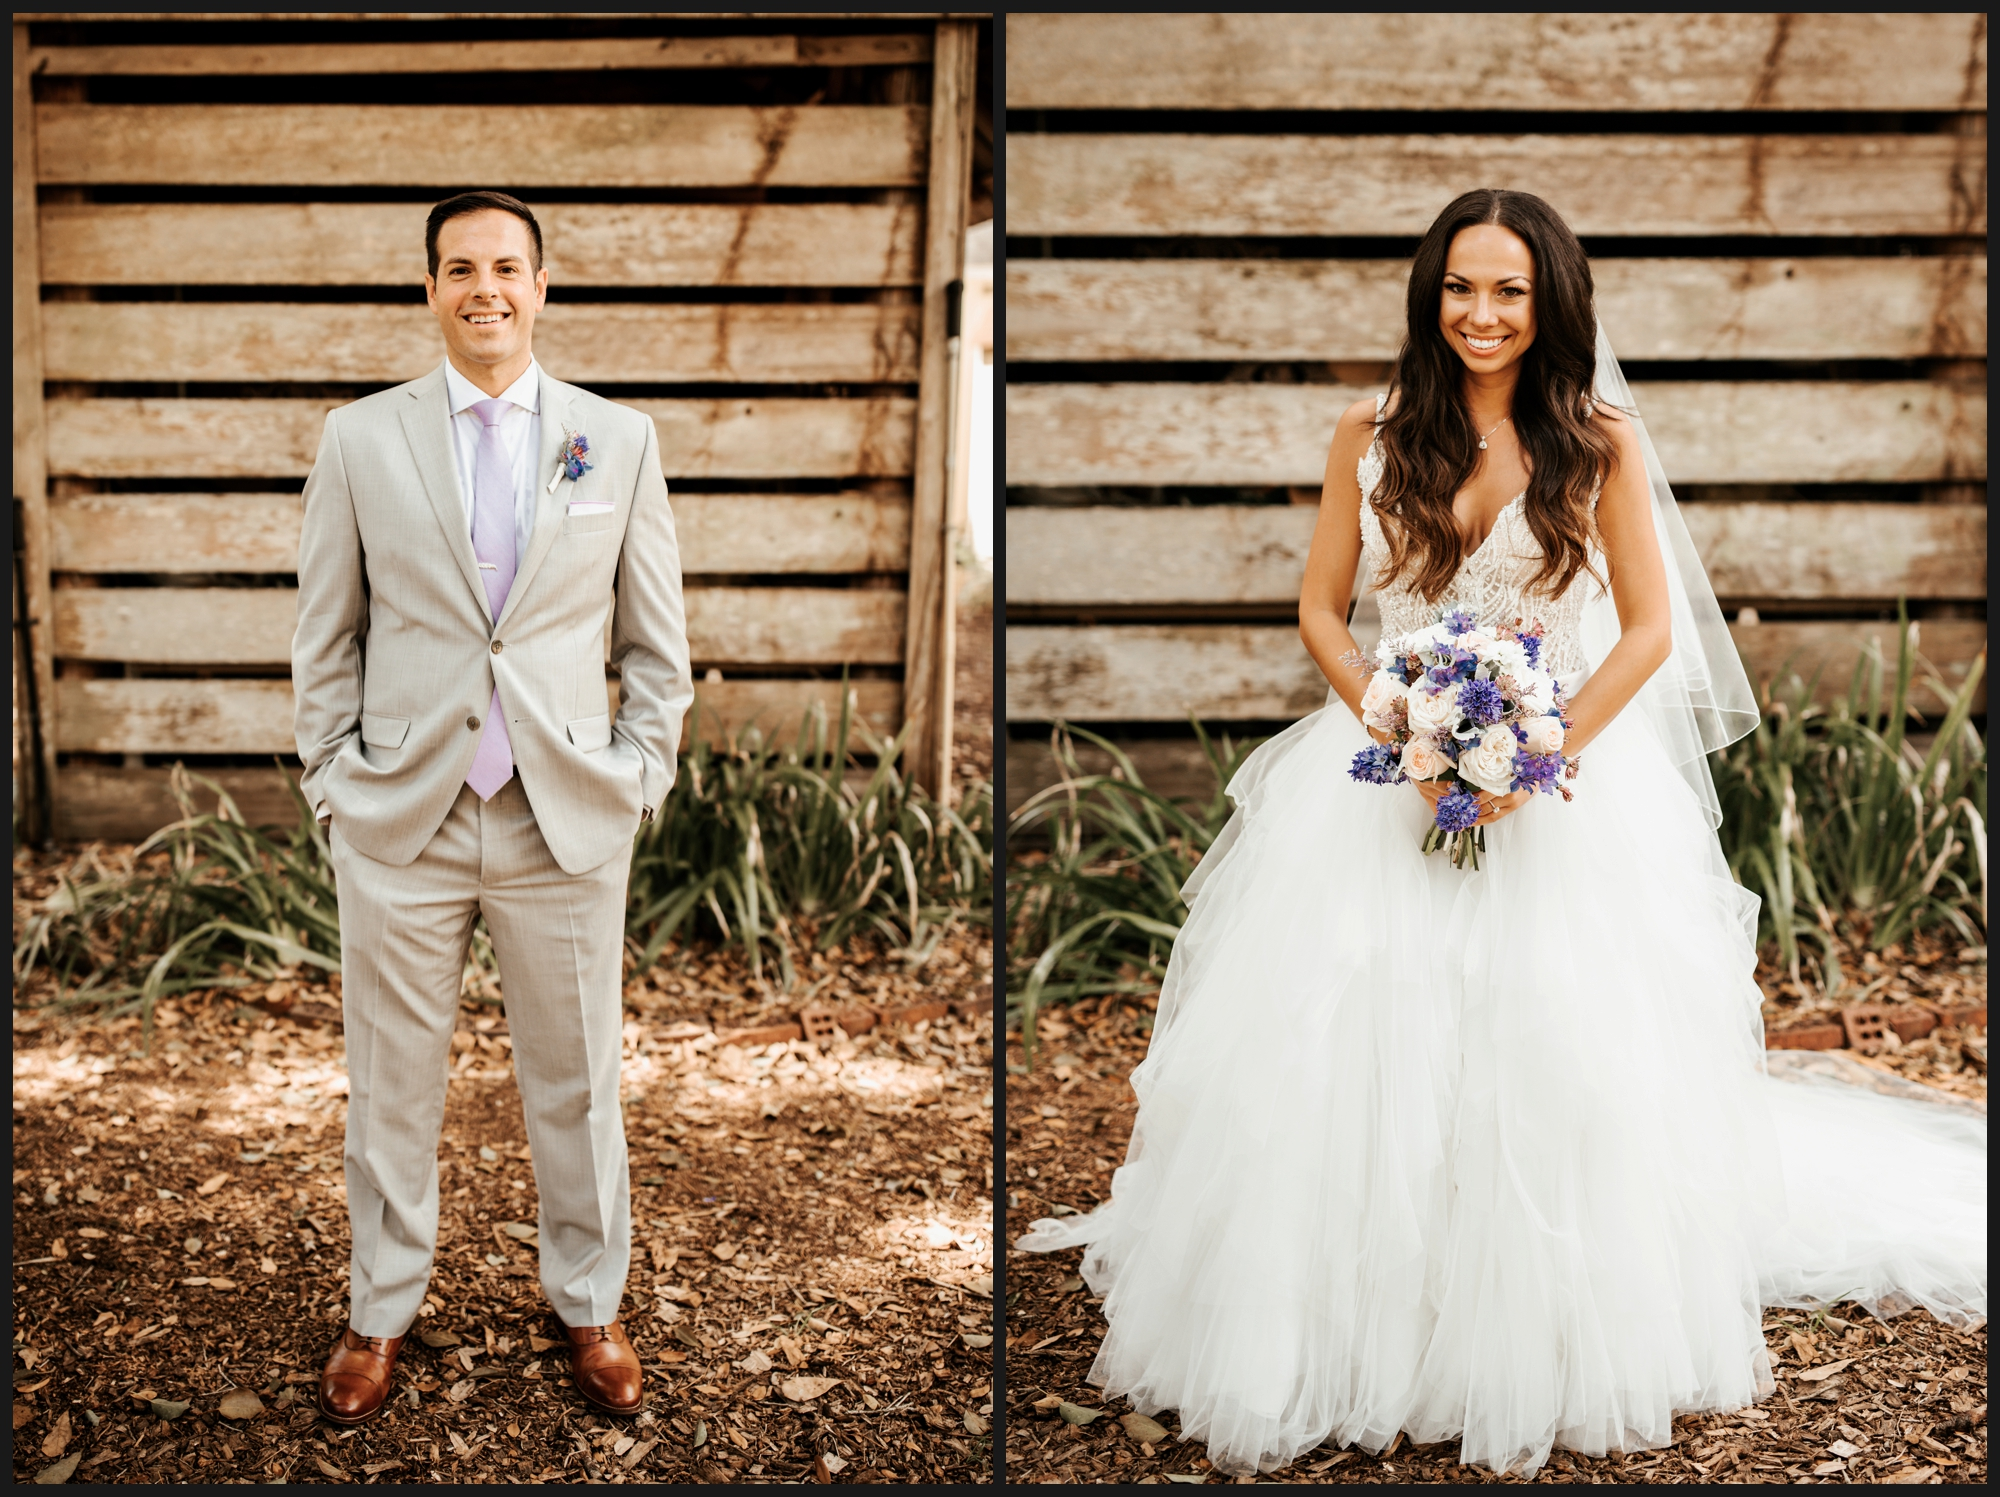 Orlando-Wedding-Photographer-destination-wedding-photographer-florida-wedding-photographer-bohemian-wedding-photographer_1560.jpg